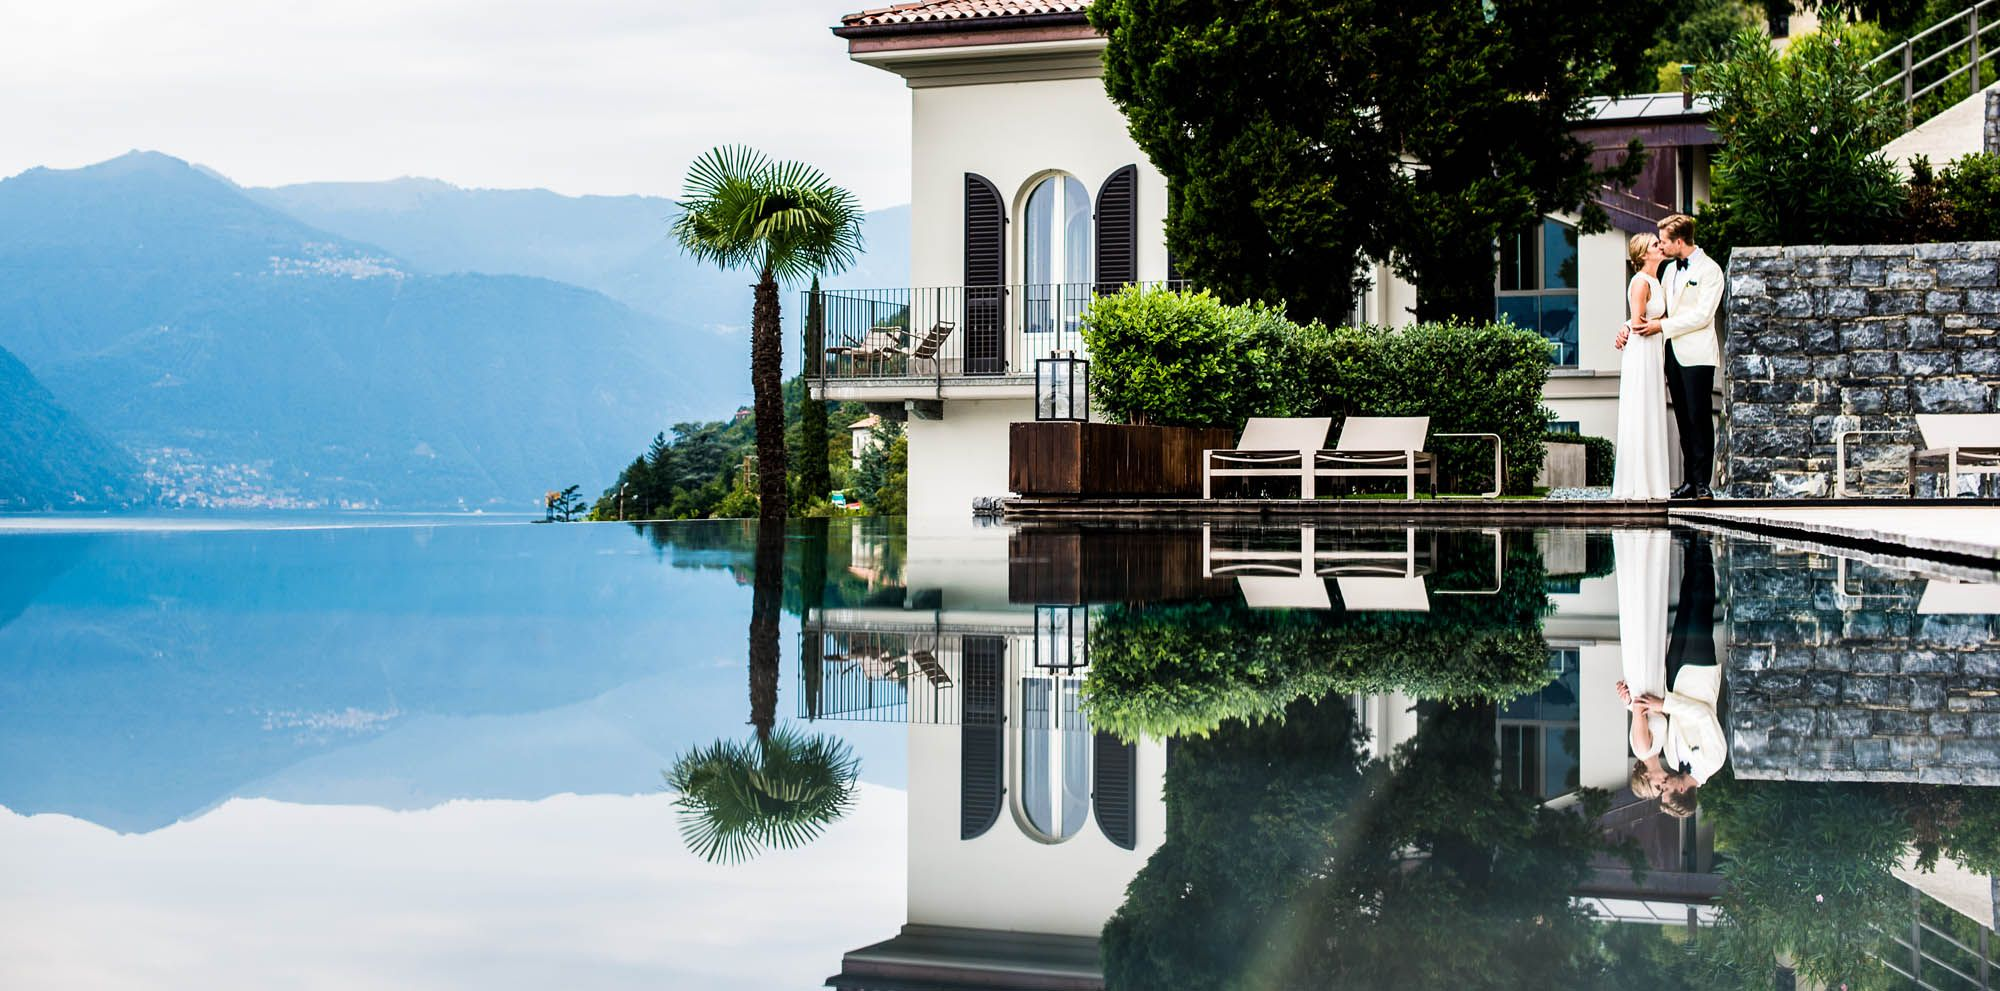 EVENTS ‹ VILLA LÀRIO Lake Como Luxury all Suite Property